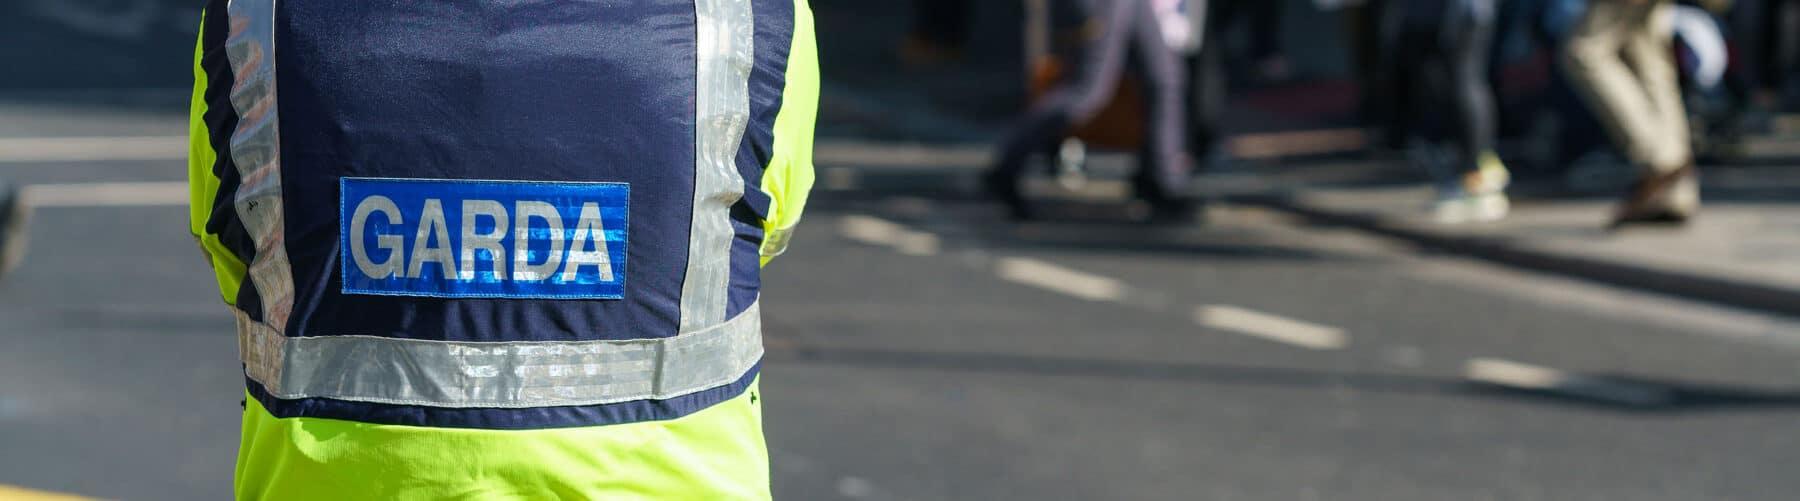 Garda standing on the street looking diligent